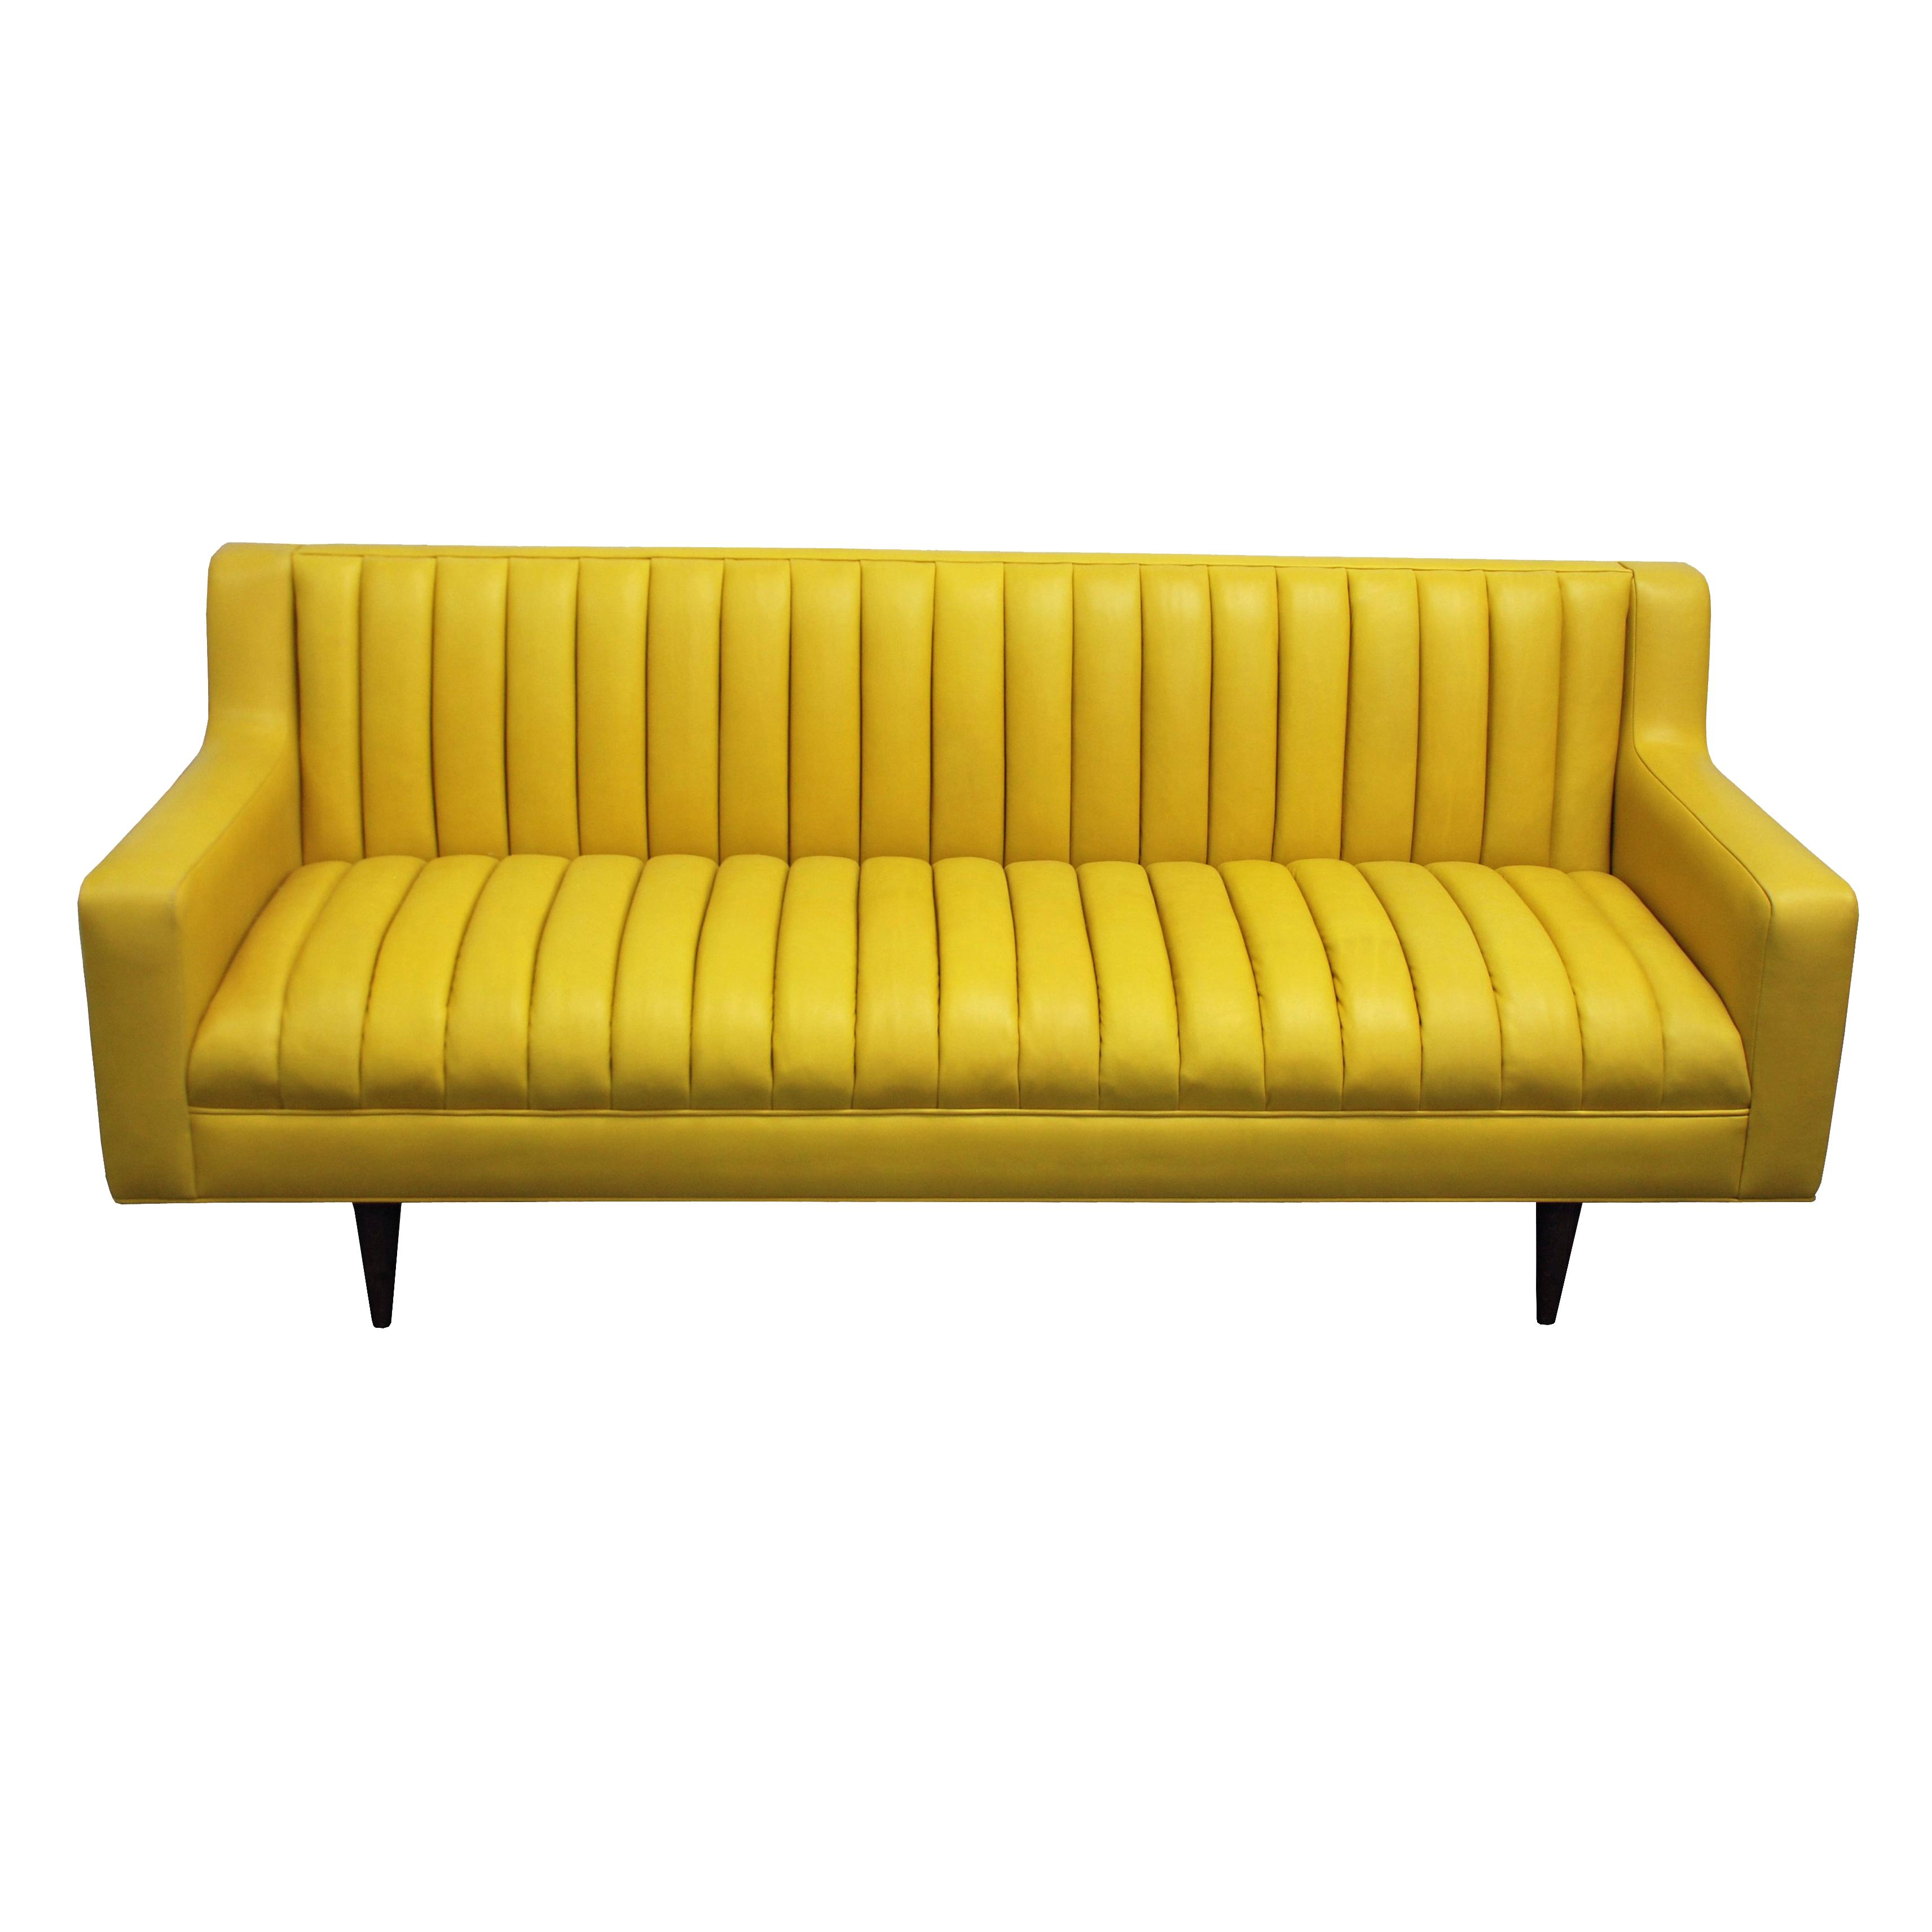 Fulham Sofa Handmade In UK Chairmaker